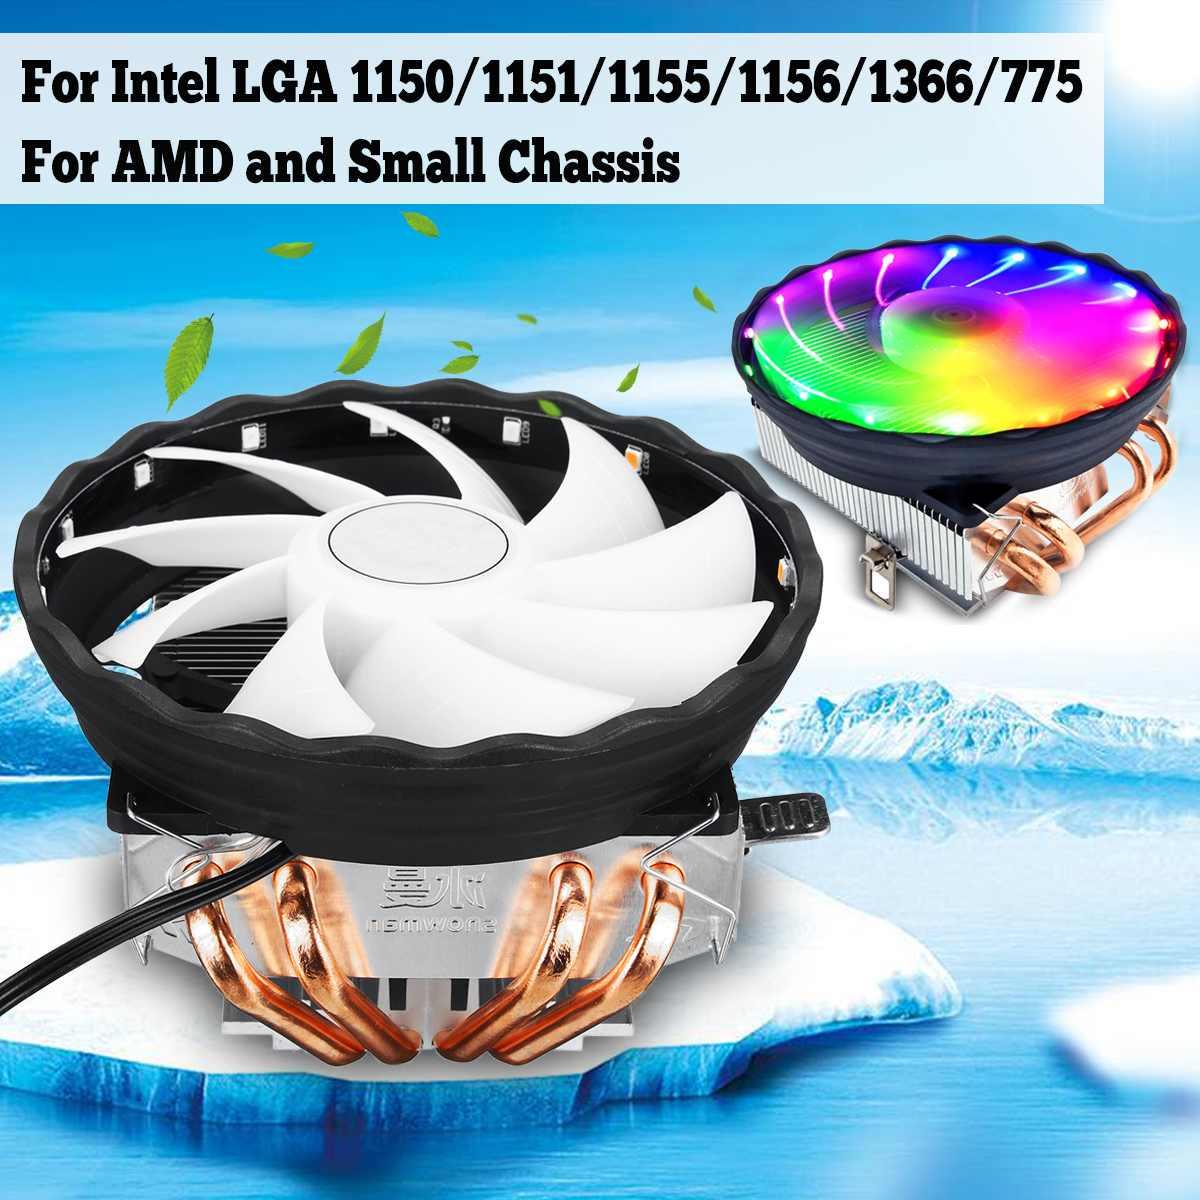 120mm LED RGB Fan 4 Heatpipe Radiator CPU Cooler Cooling for Intel LGA 1150/1151/1155/1156/1366/775 for AMD AM3+ AM3 AM2+ AM2